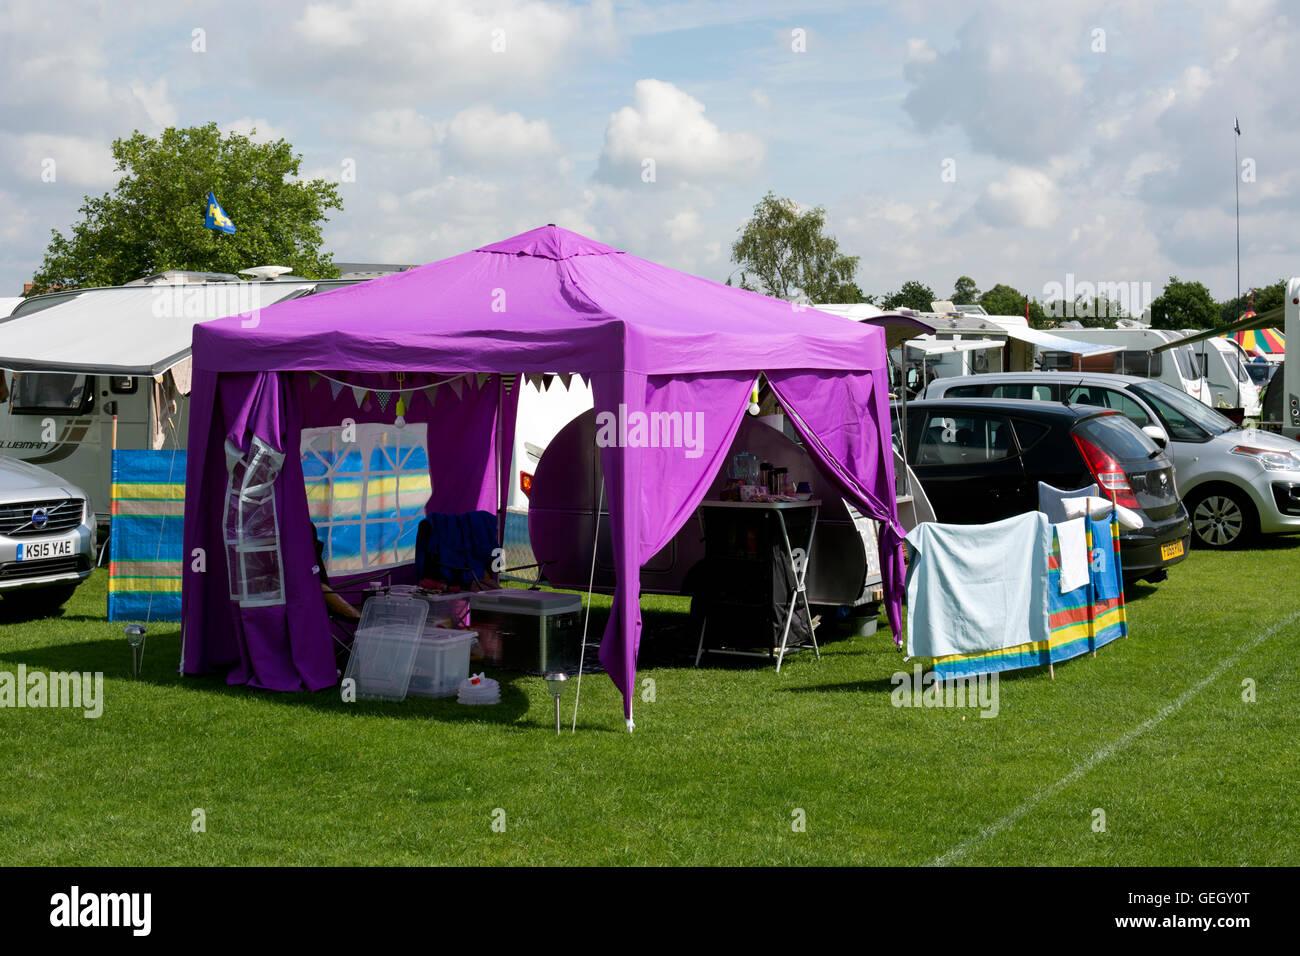 A gazebo at the Warwick Folk Festival campsite, Warwick, UK - Stock Image